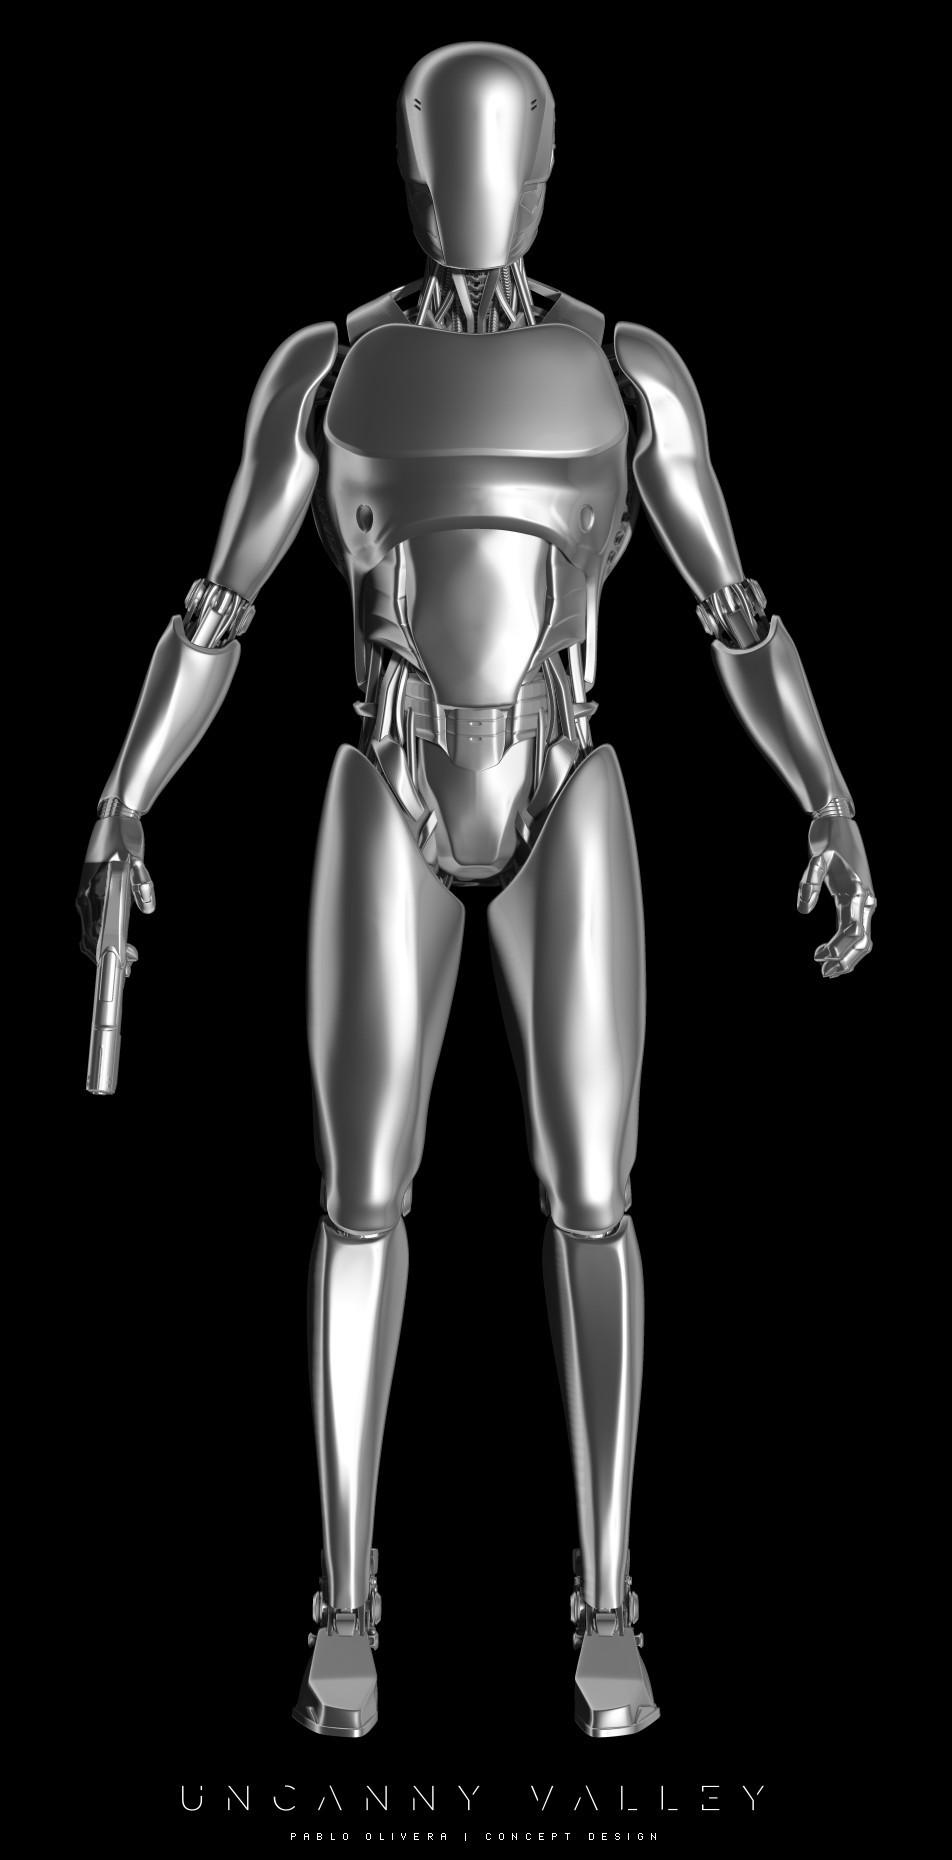 Pablo olivera pablo olivera uncanny valley character design robot 01